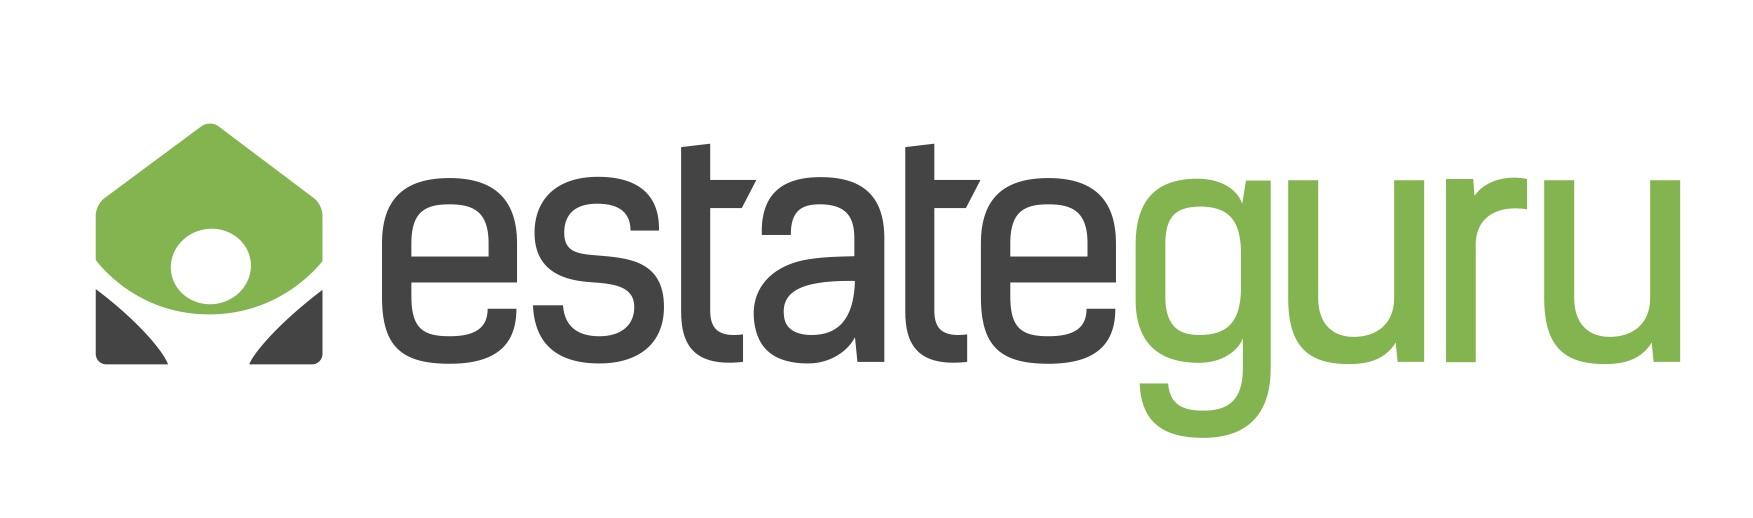 estateguru-logo-live